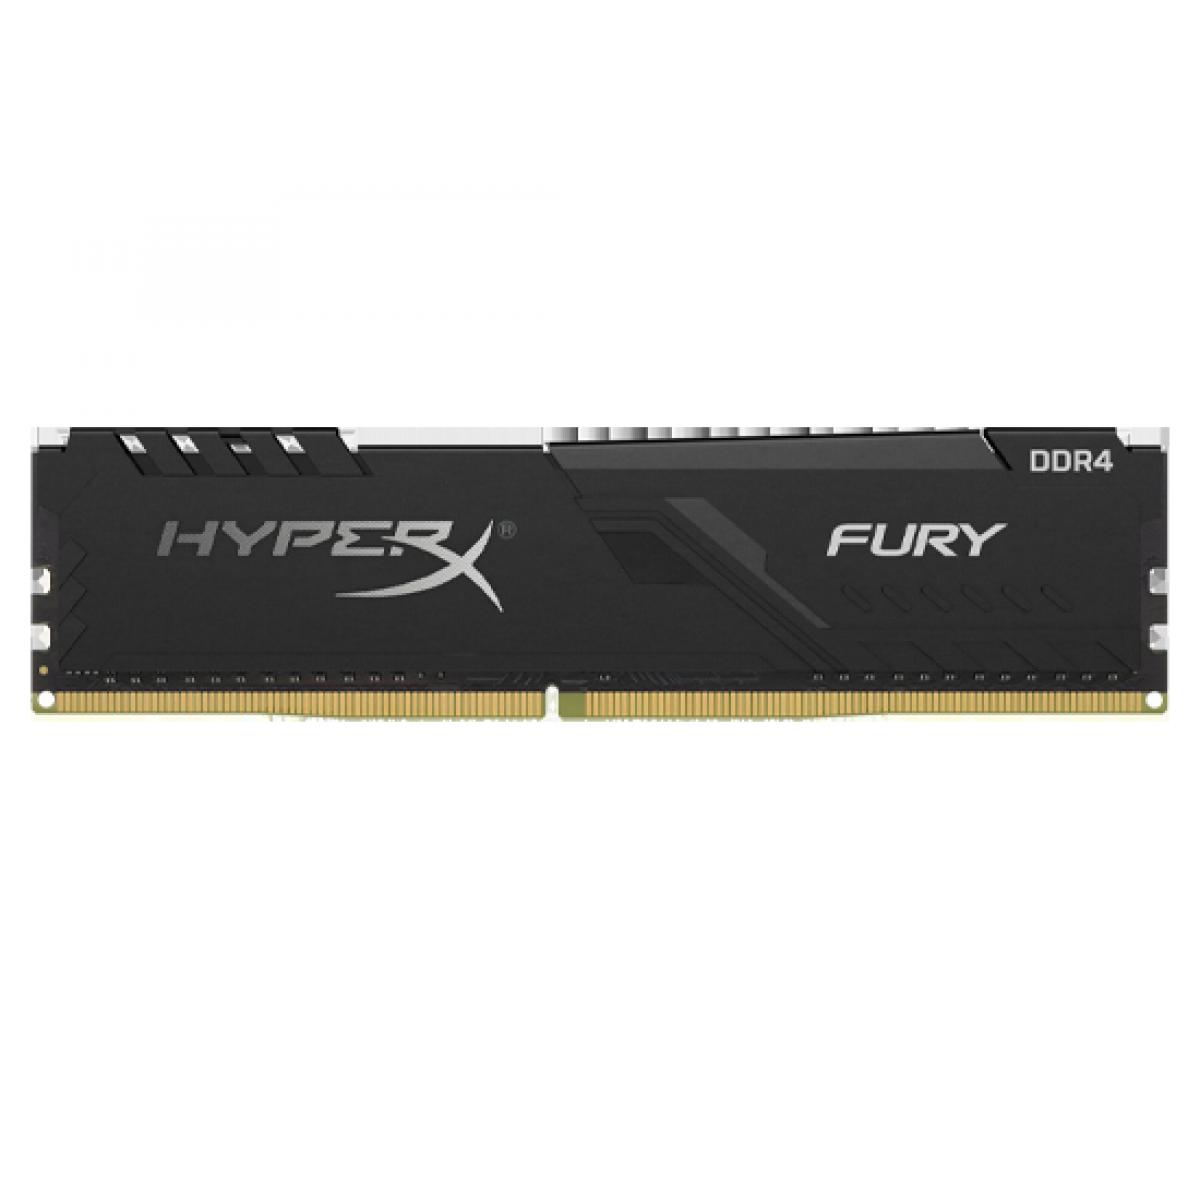 Memória DDR4 Kingston HyperX Fury, 16GB 3000MHz, Black, HX430C15FB3/16